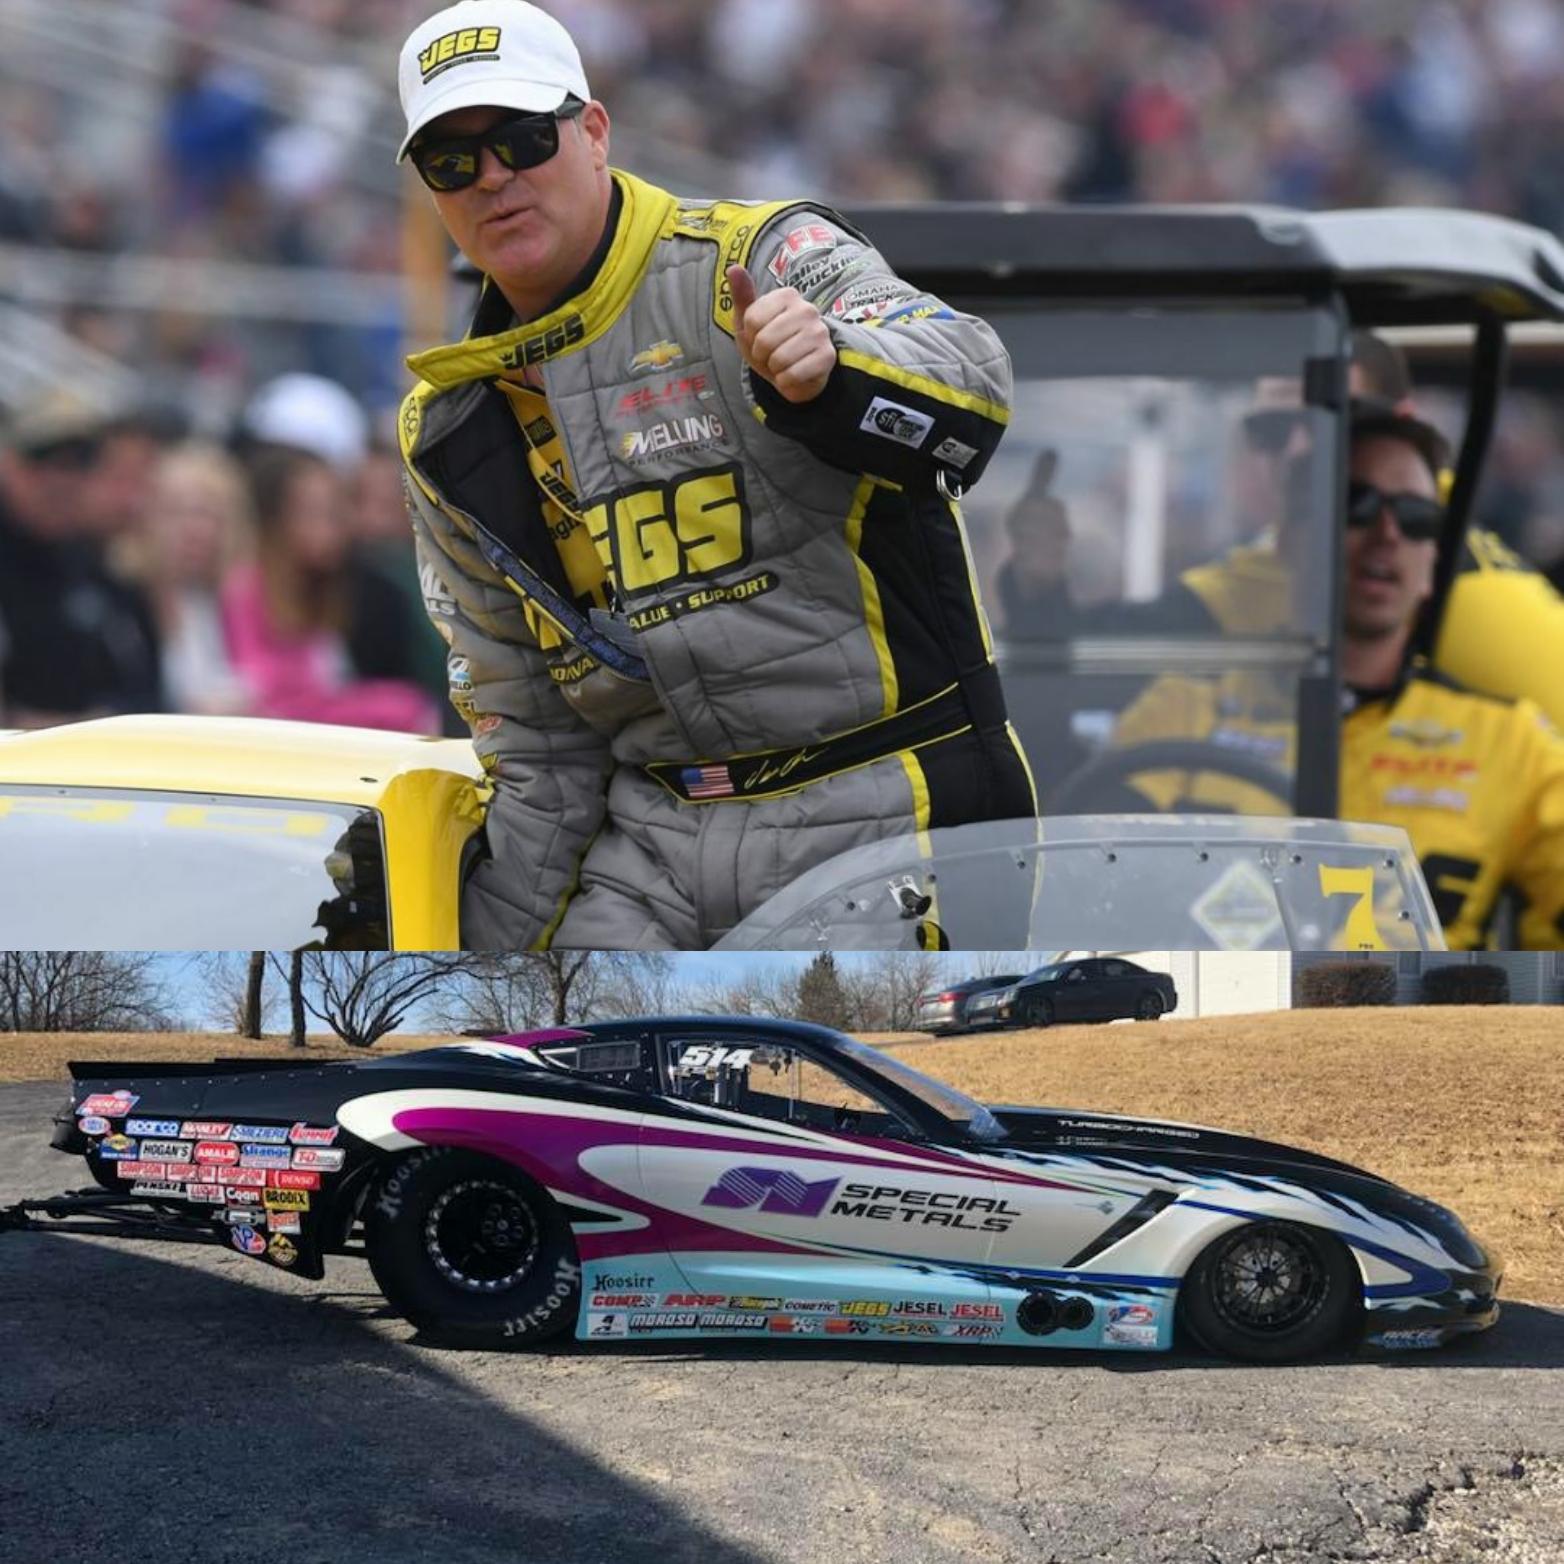 Jeg Coughlin Jr. Set to Drive Phil Unruh's  Twin Turbo C7